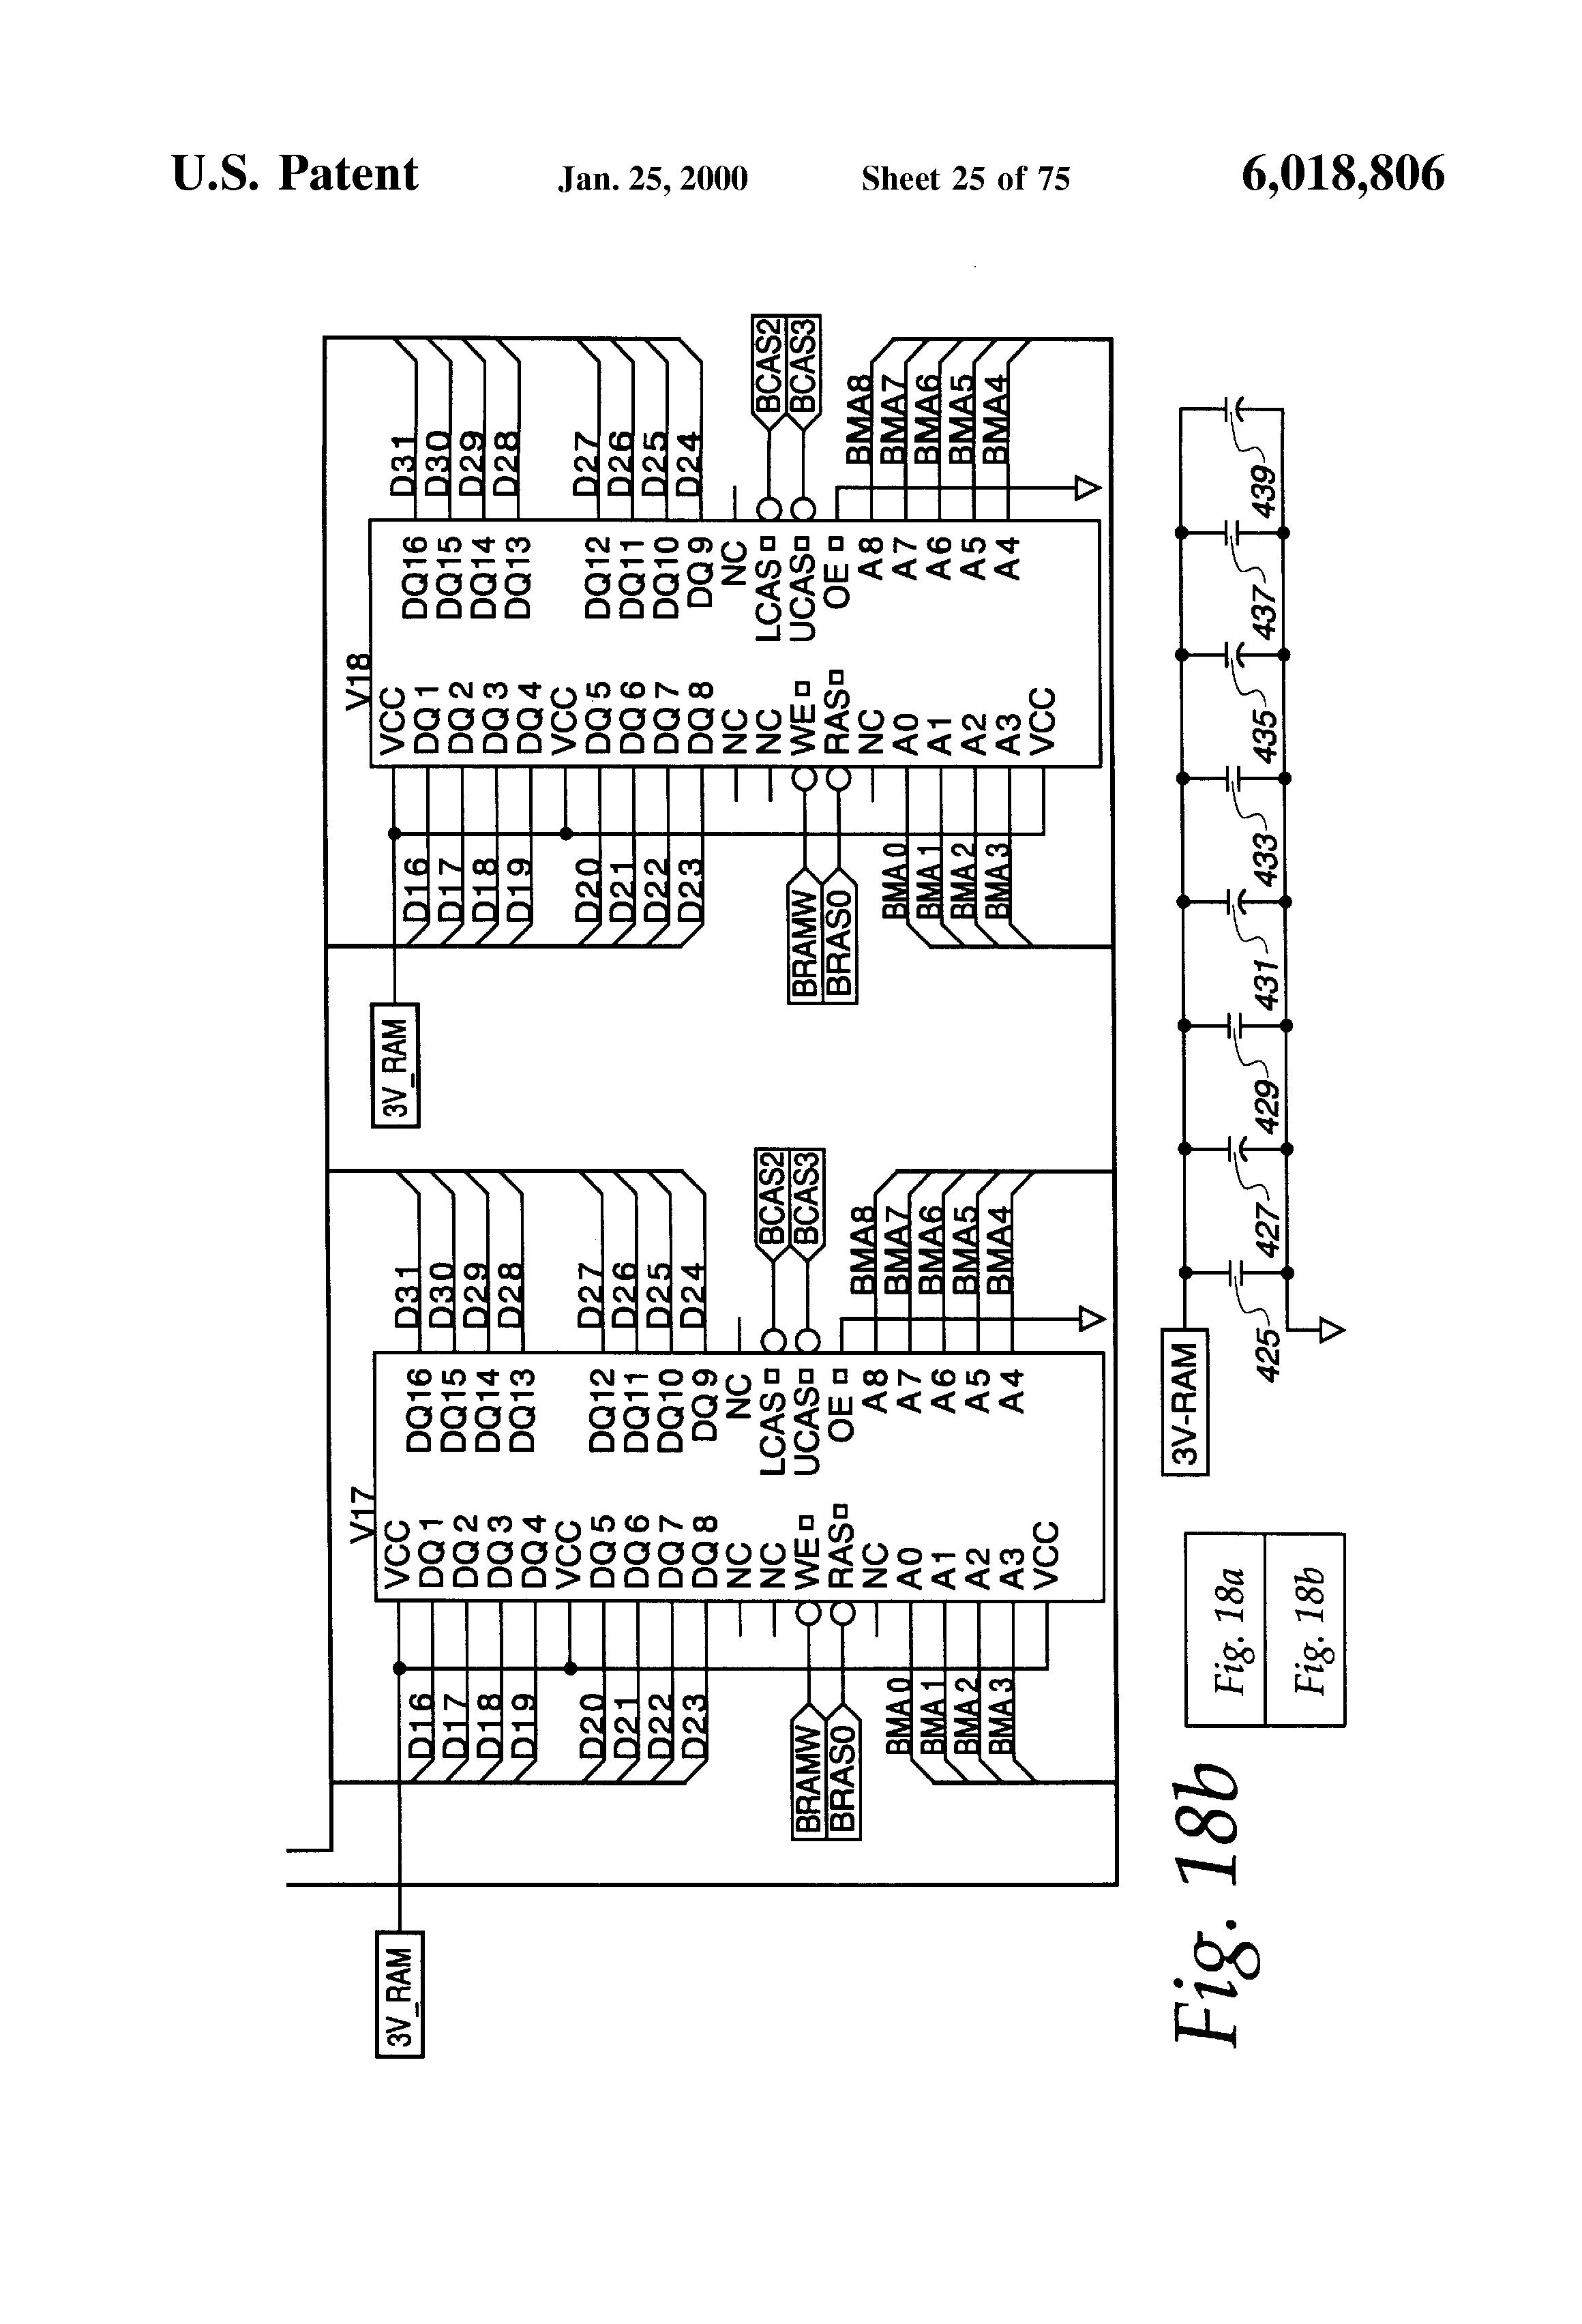 Generous Cat 3406e Ecm Wiring Diagram Gallery - Electrical Circuit ...